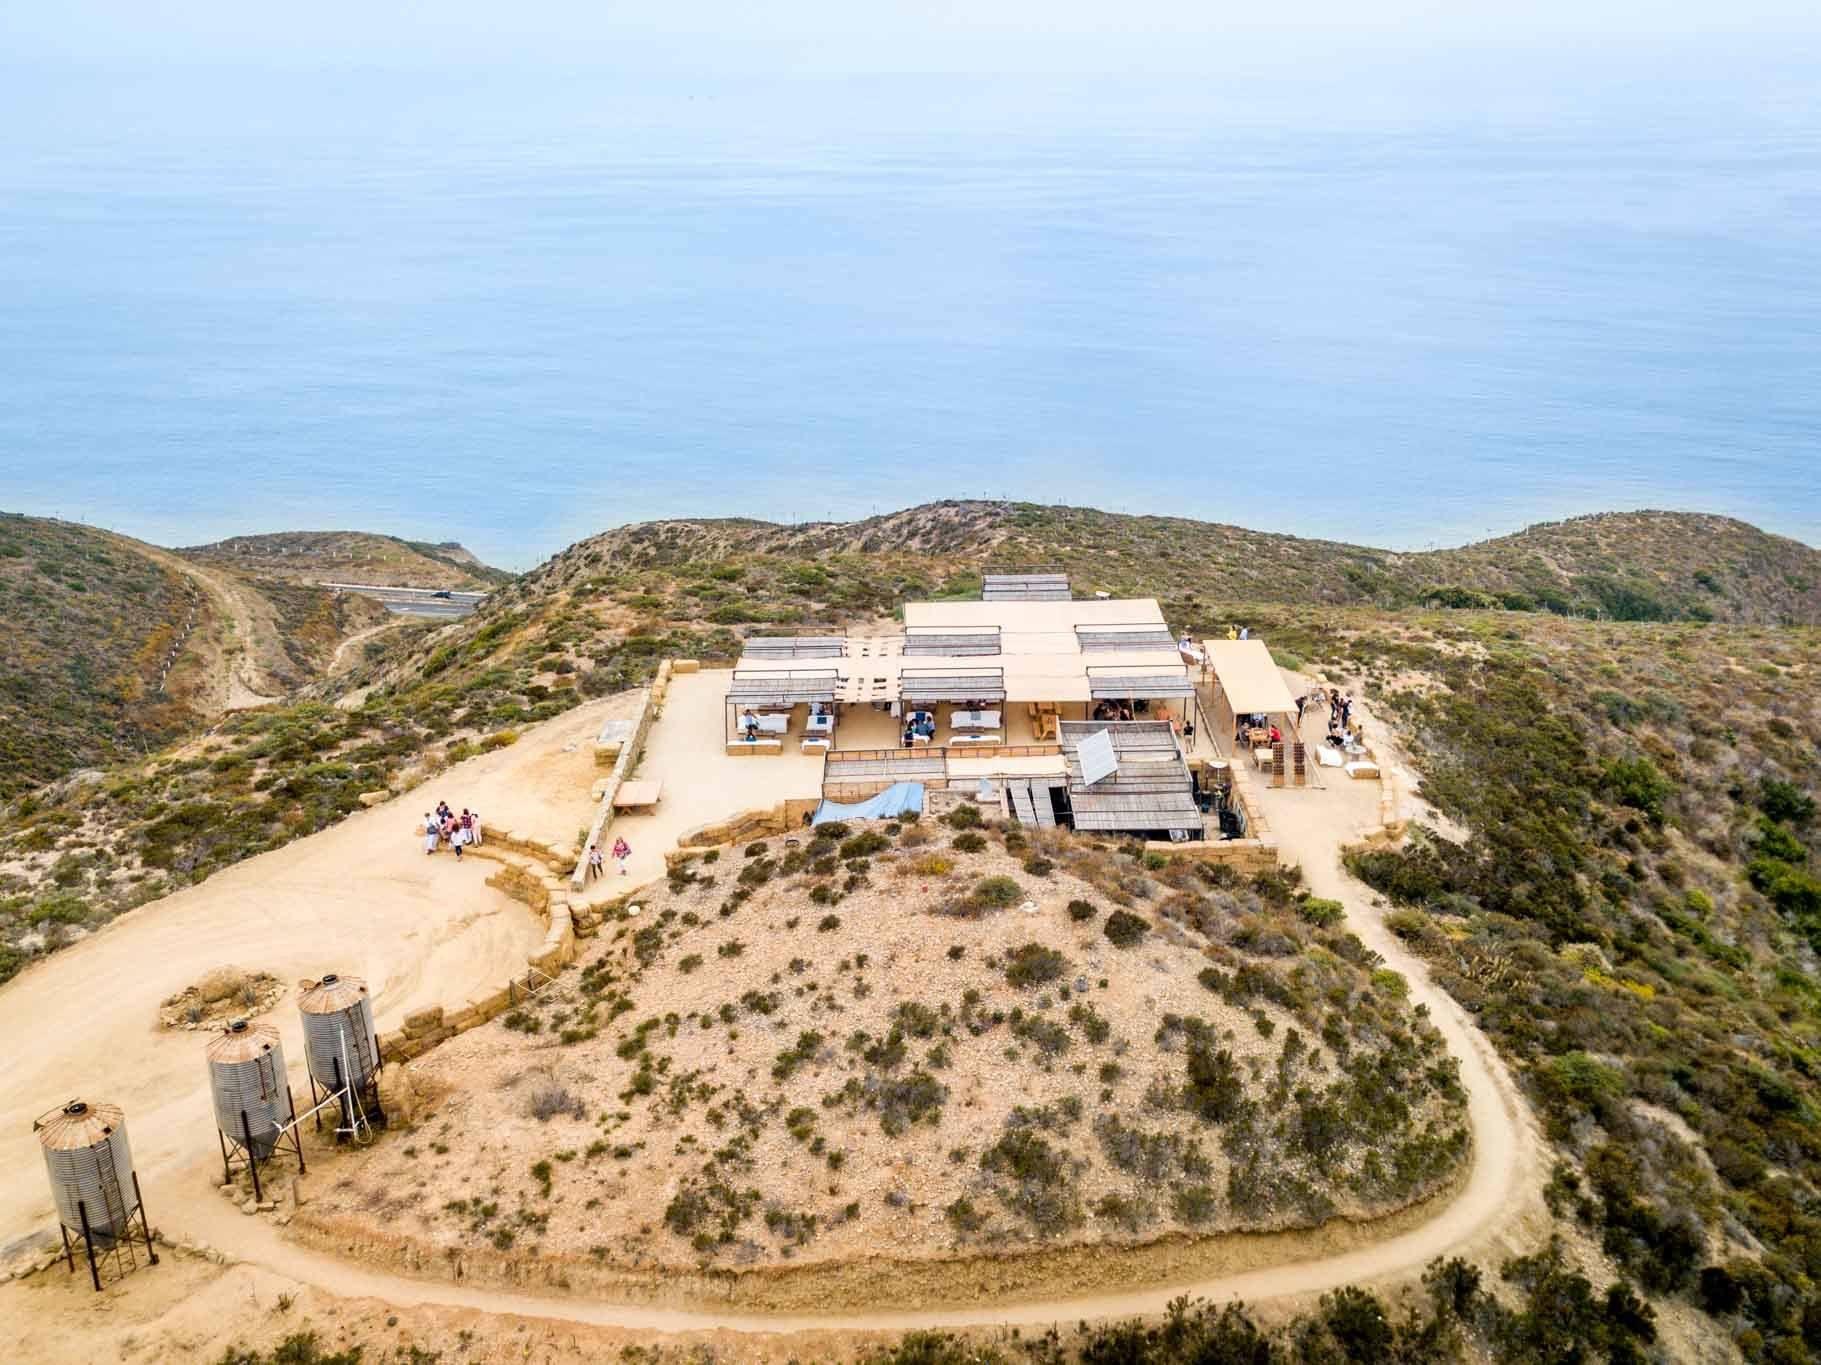 Aerial view of the incredible Bar Bura at Cuatro Cuatros overlooking the Pacific Ocean